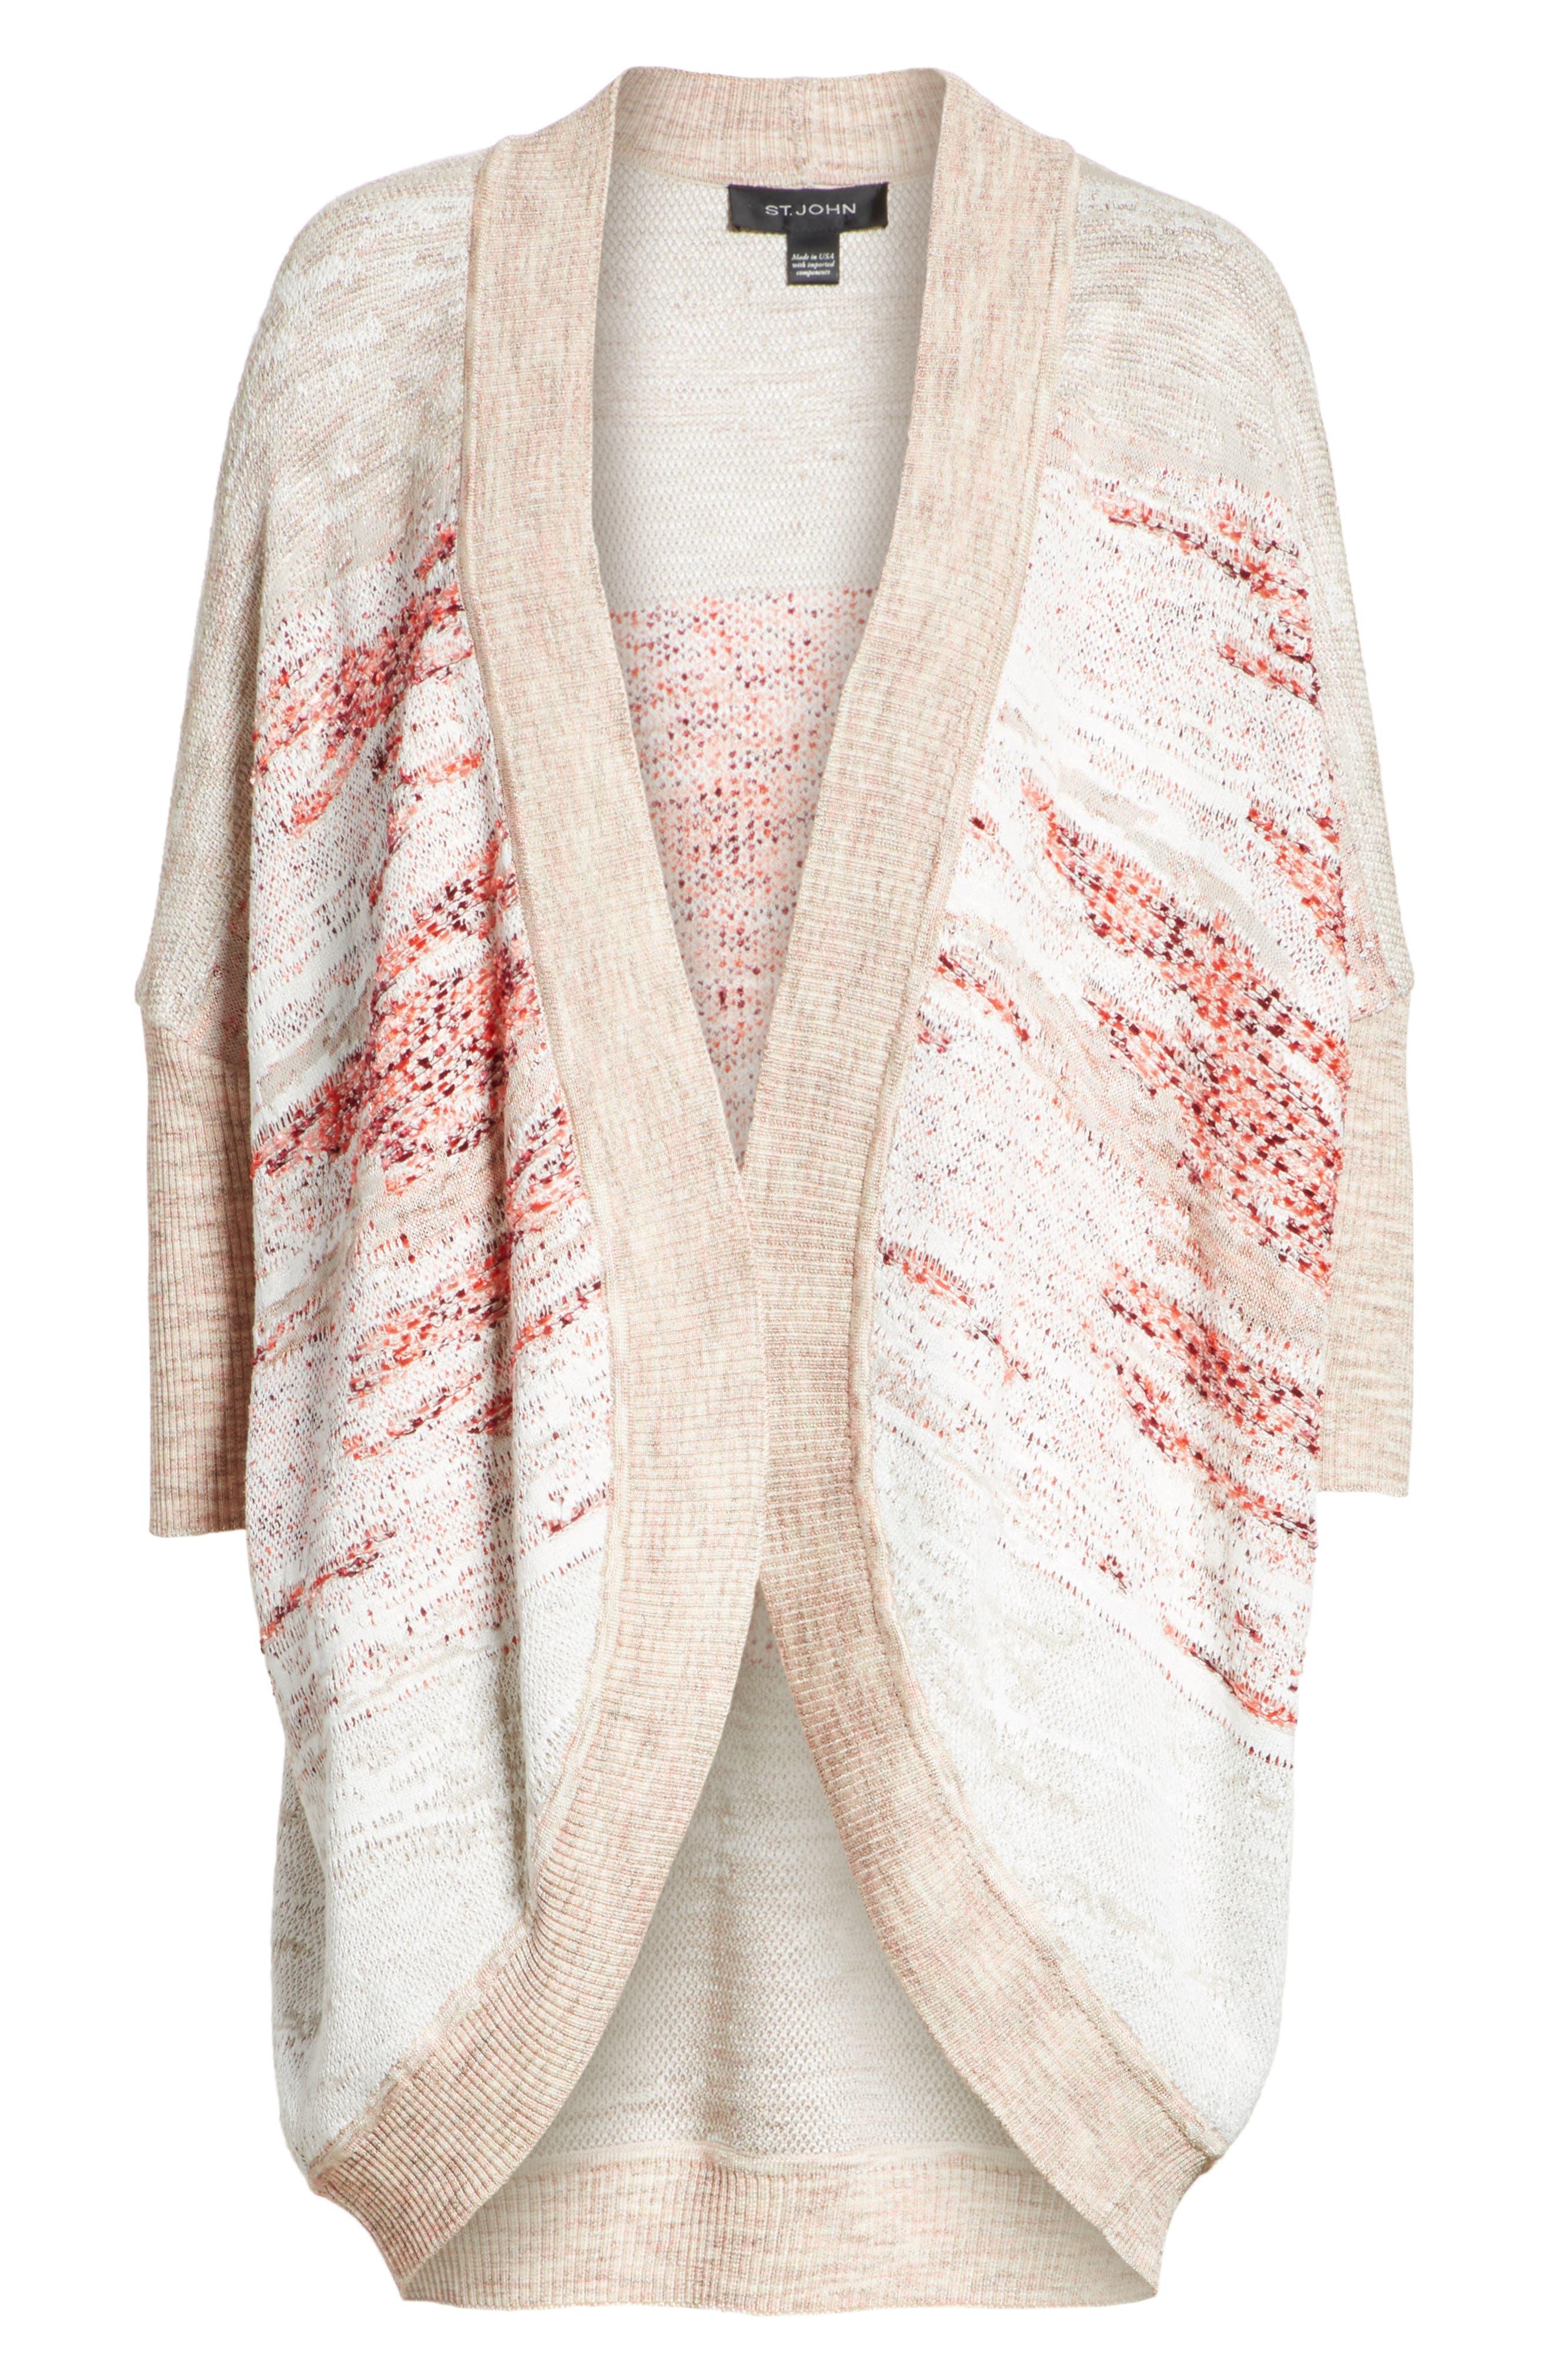 Ombré Textured Jacquard Knit Cardigan,                             Alternate thumbnail 6, color,                             050